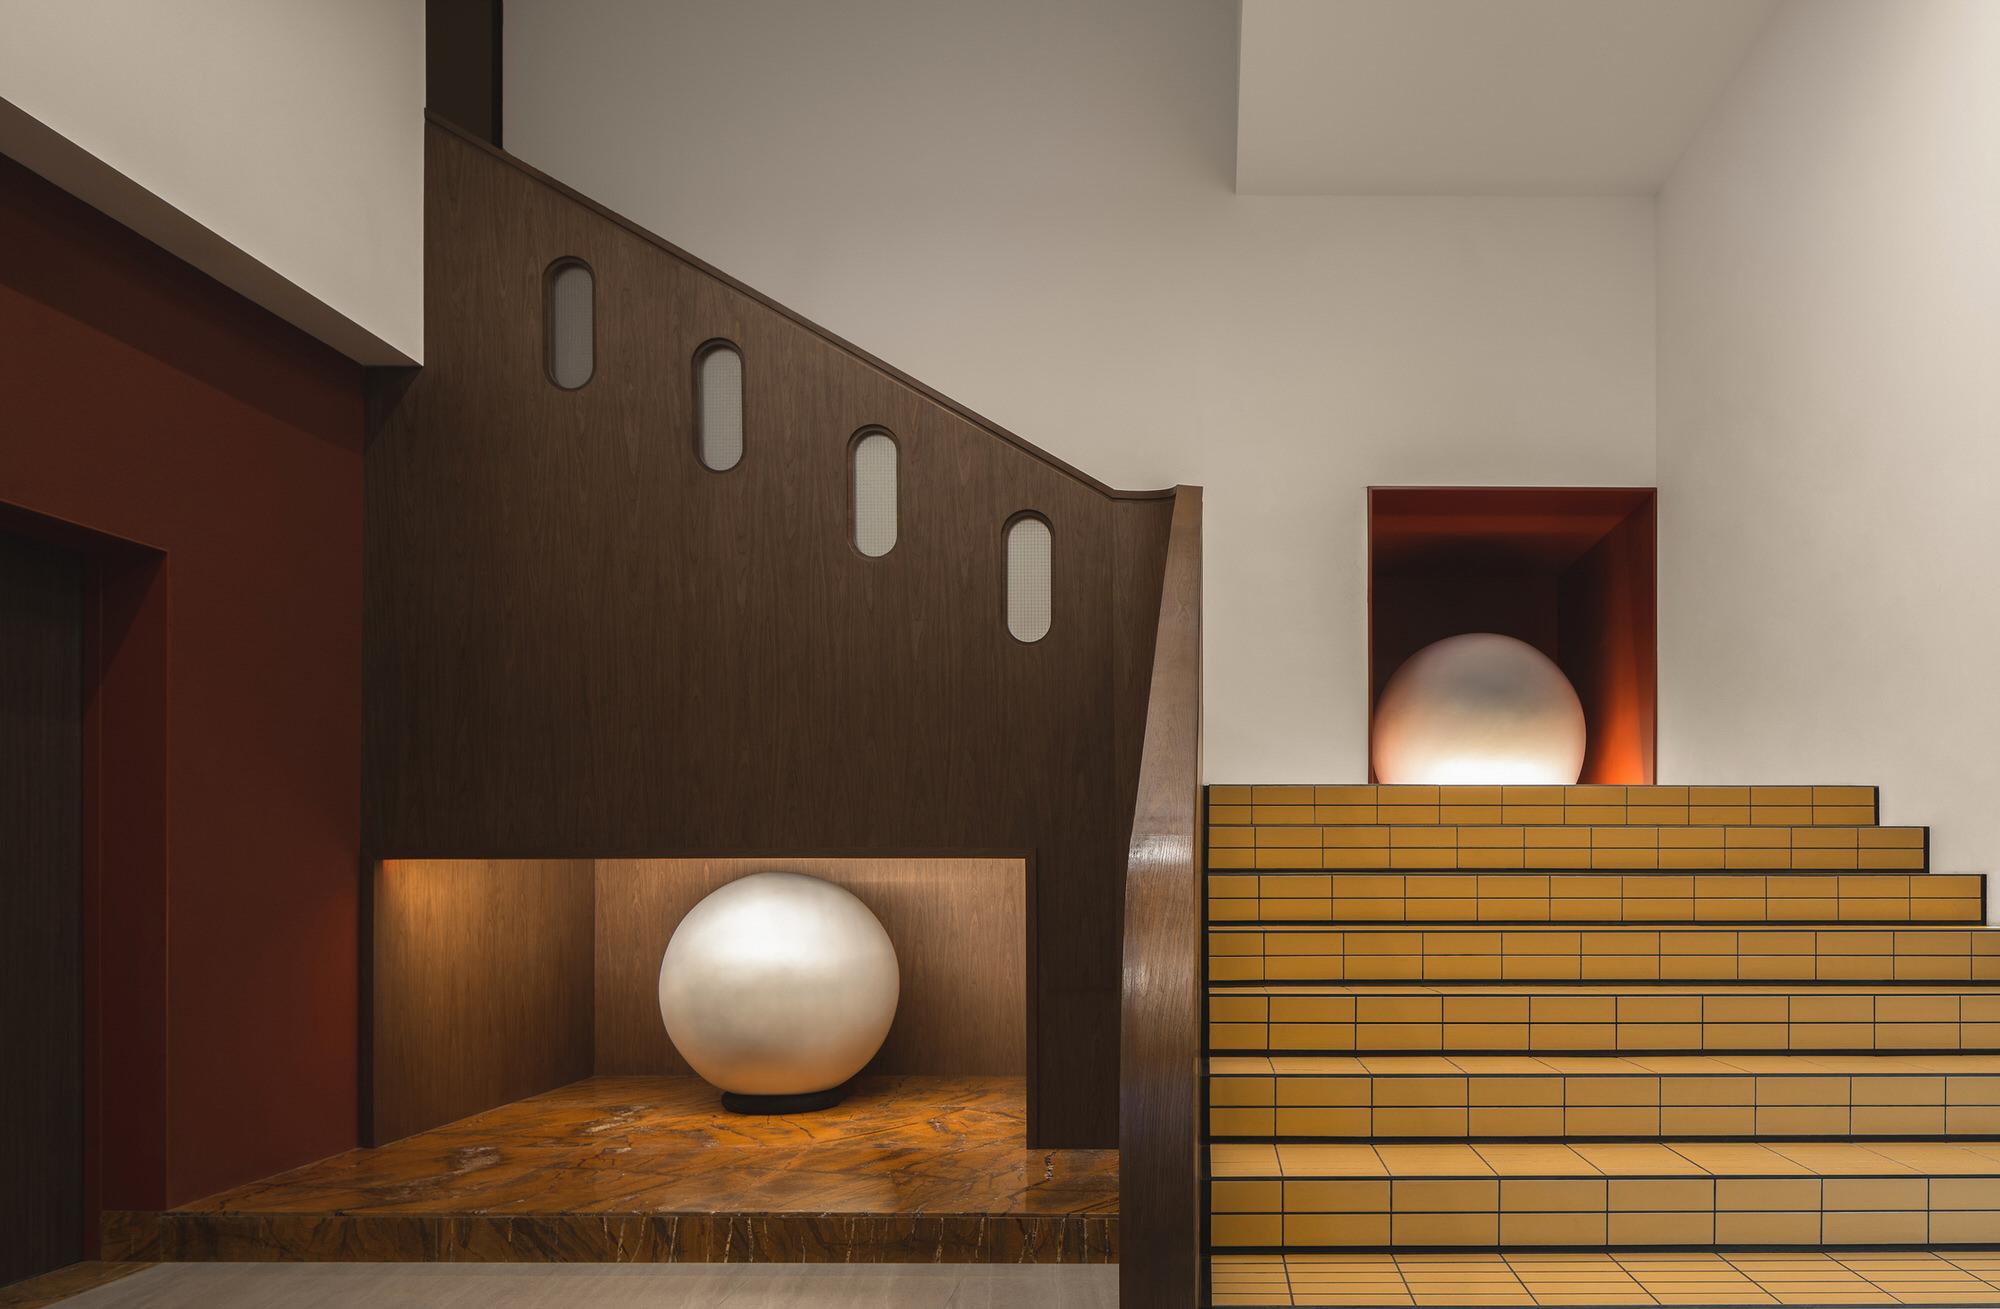 Archetype Design Organization Buda Hotel Chengdu Photo Here Space Yellowtrace 04